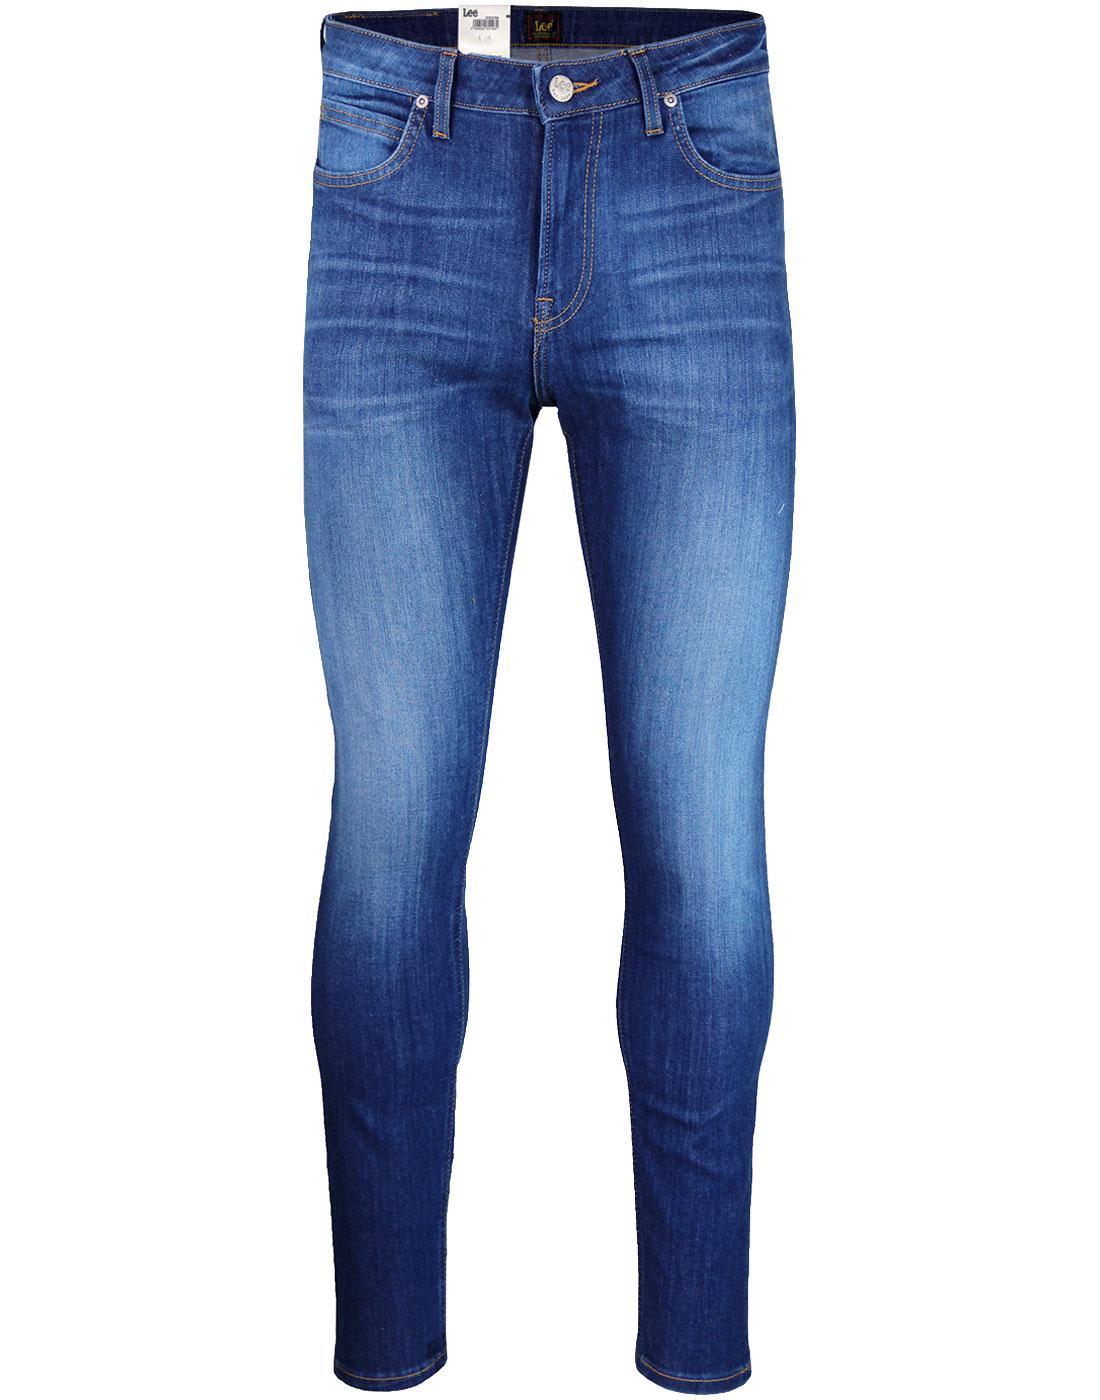 Malone LEE Men's Skinny Denim Jeans WORN MISFIT